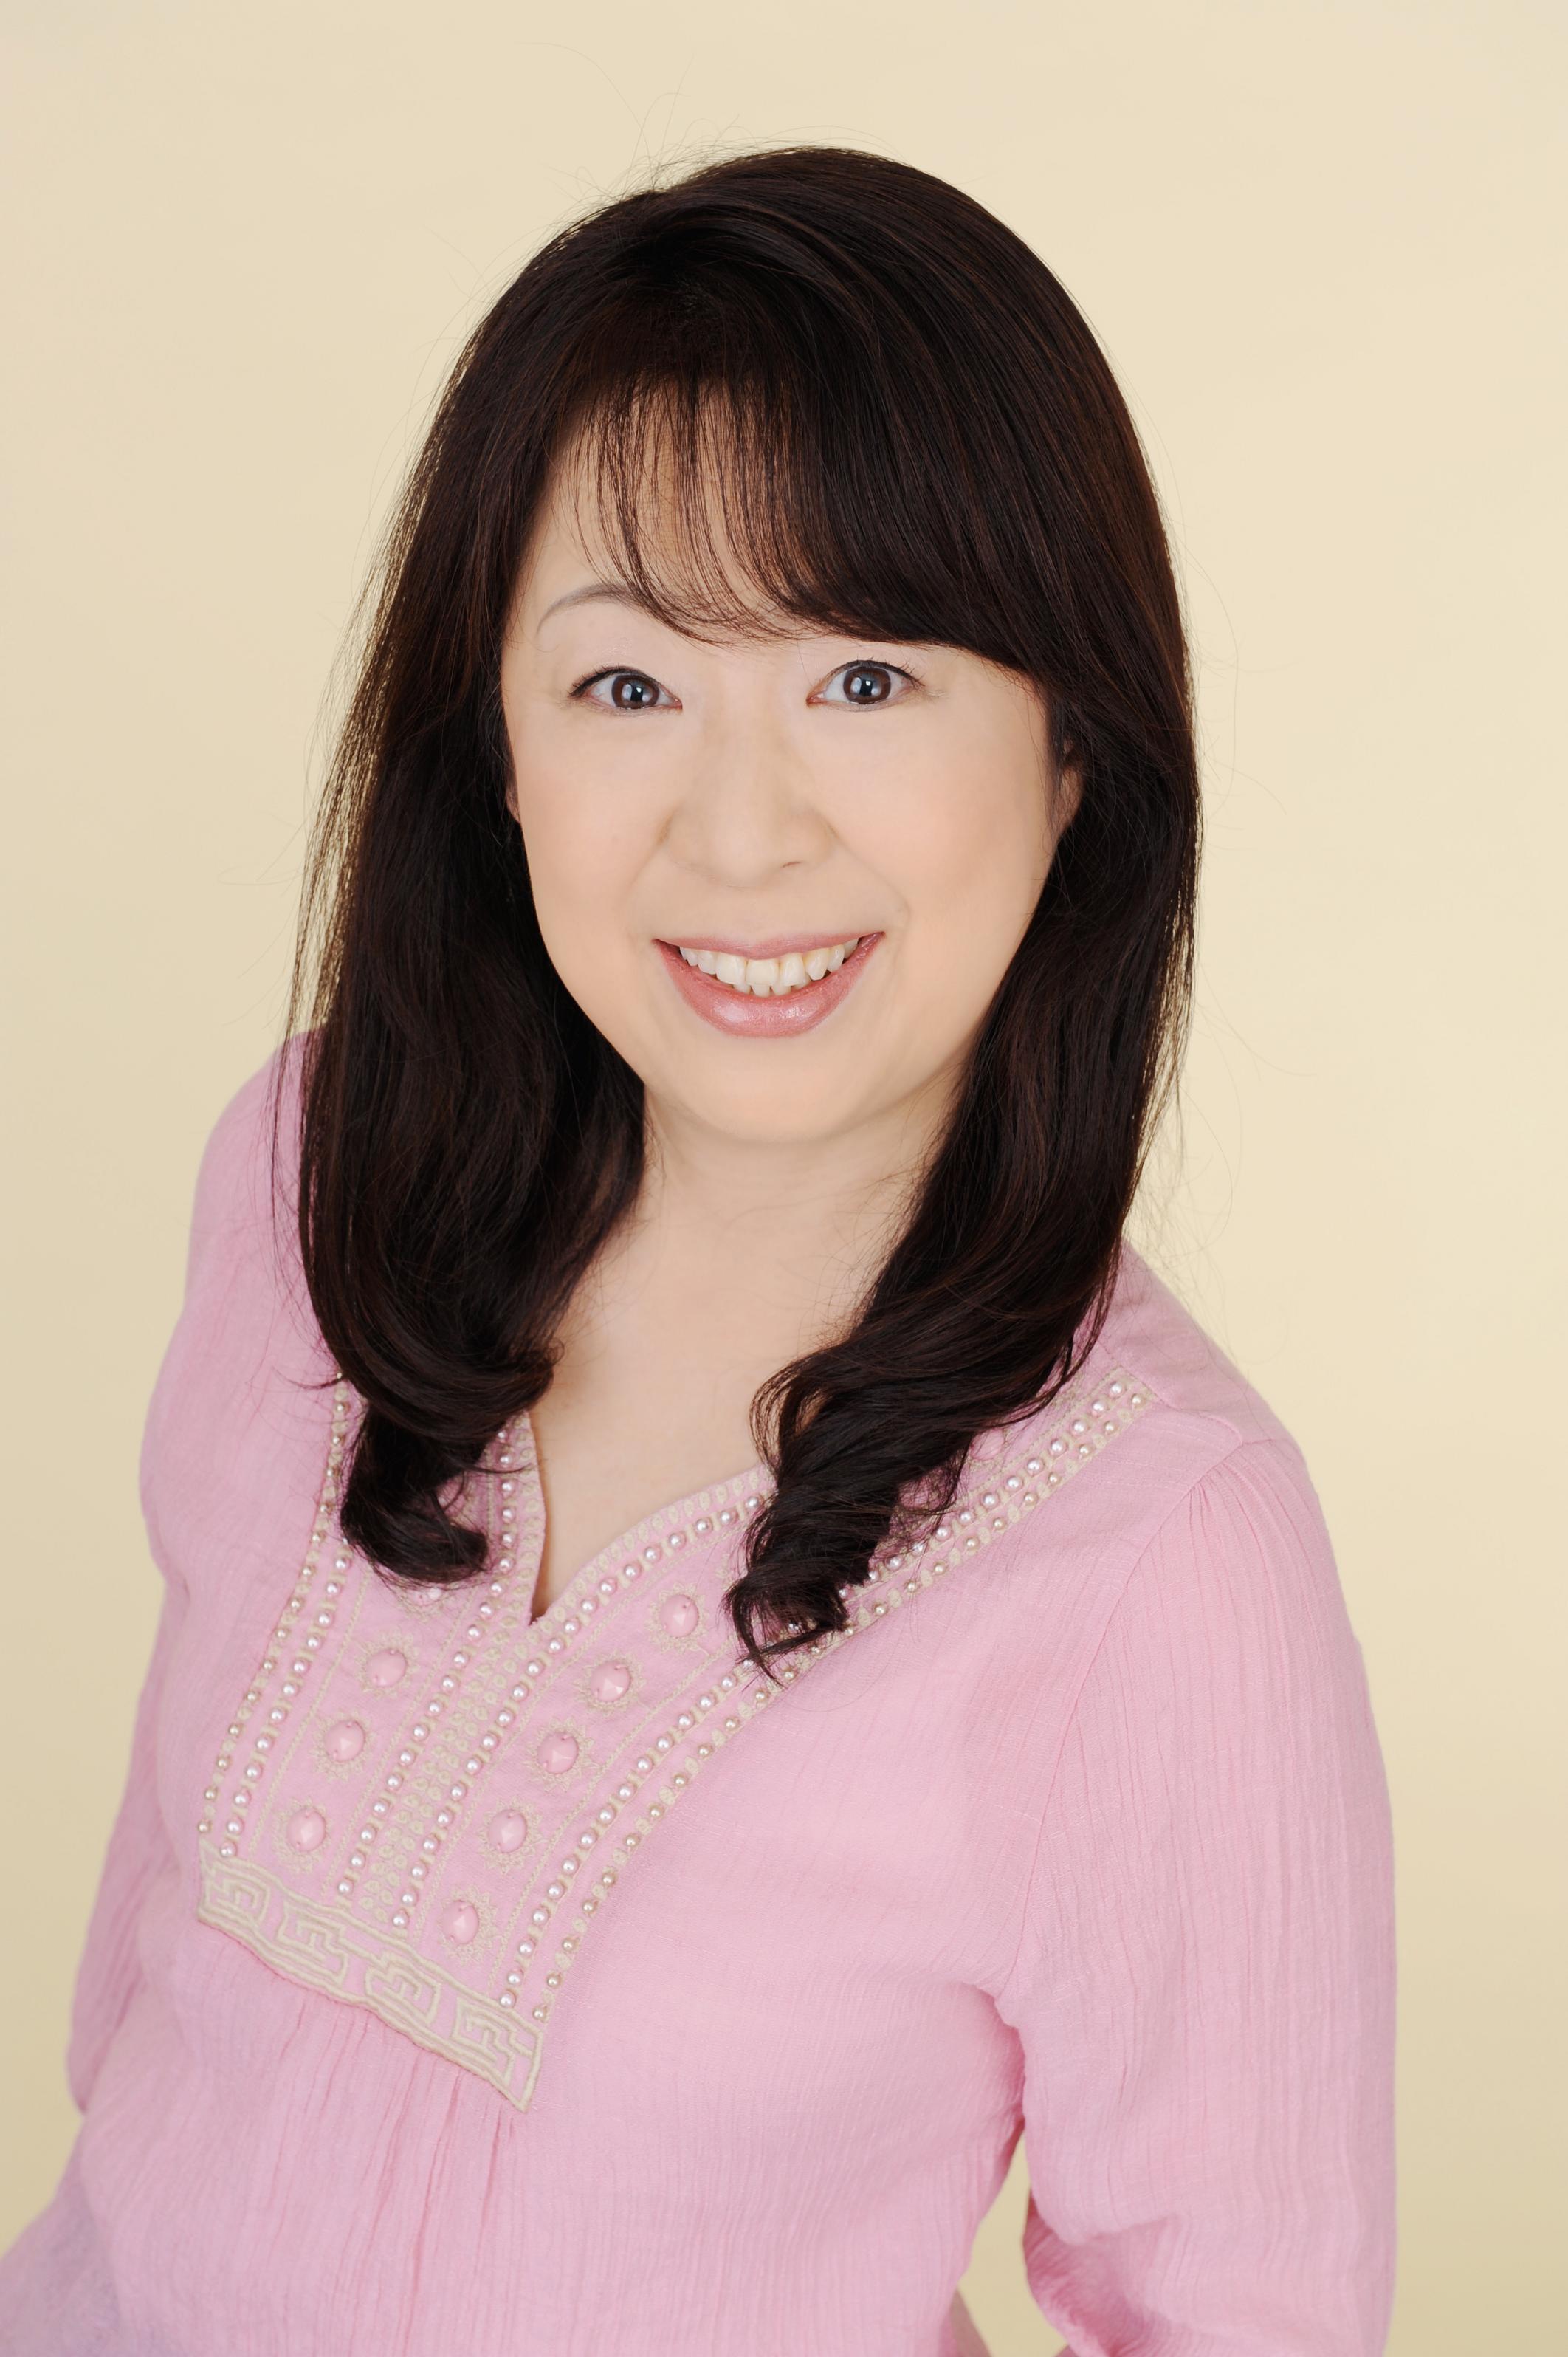 Kitano Nozomi 北野のぞみ それはすぐに私は行くべきである O O Upload: 曼荼羅アート・ 手作り万華鏡 アトリエM(神戸・芦屋)